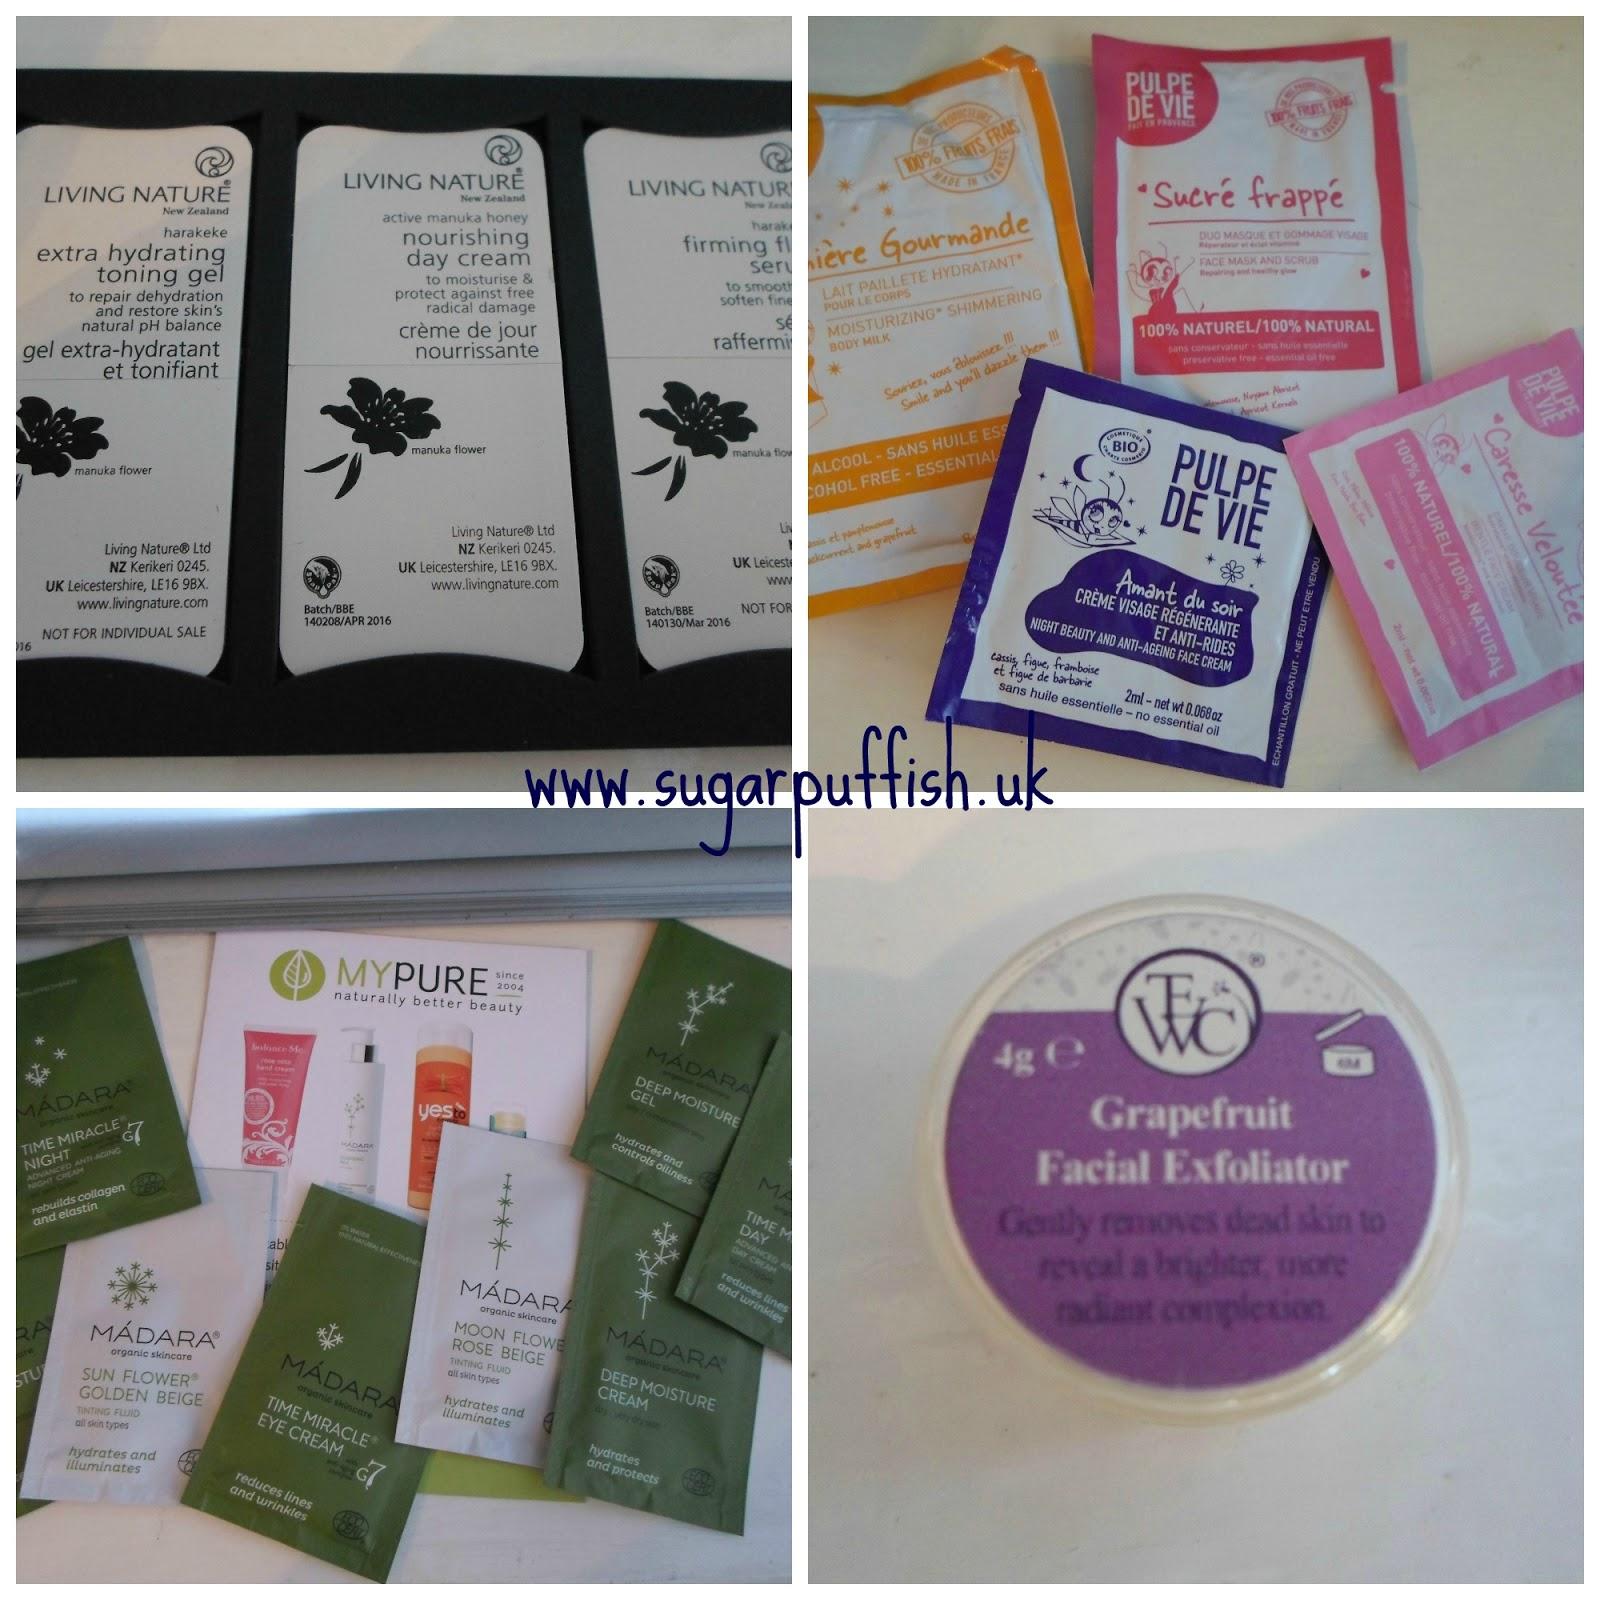 Samples - Living Nature, Pulpe De Vie, TEWC, Madara, Herbfarmacy